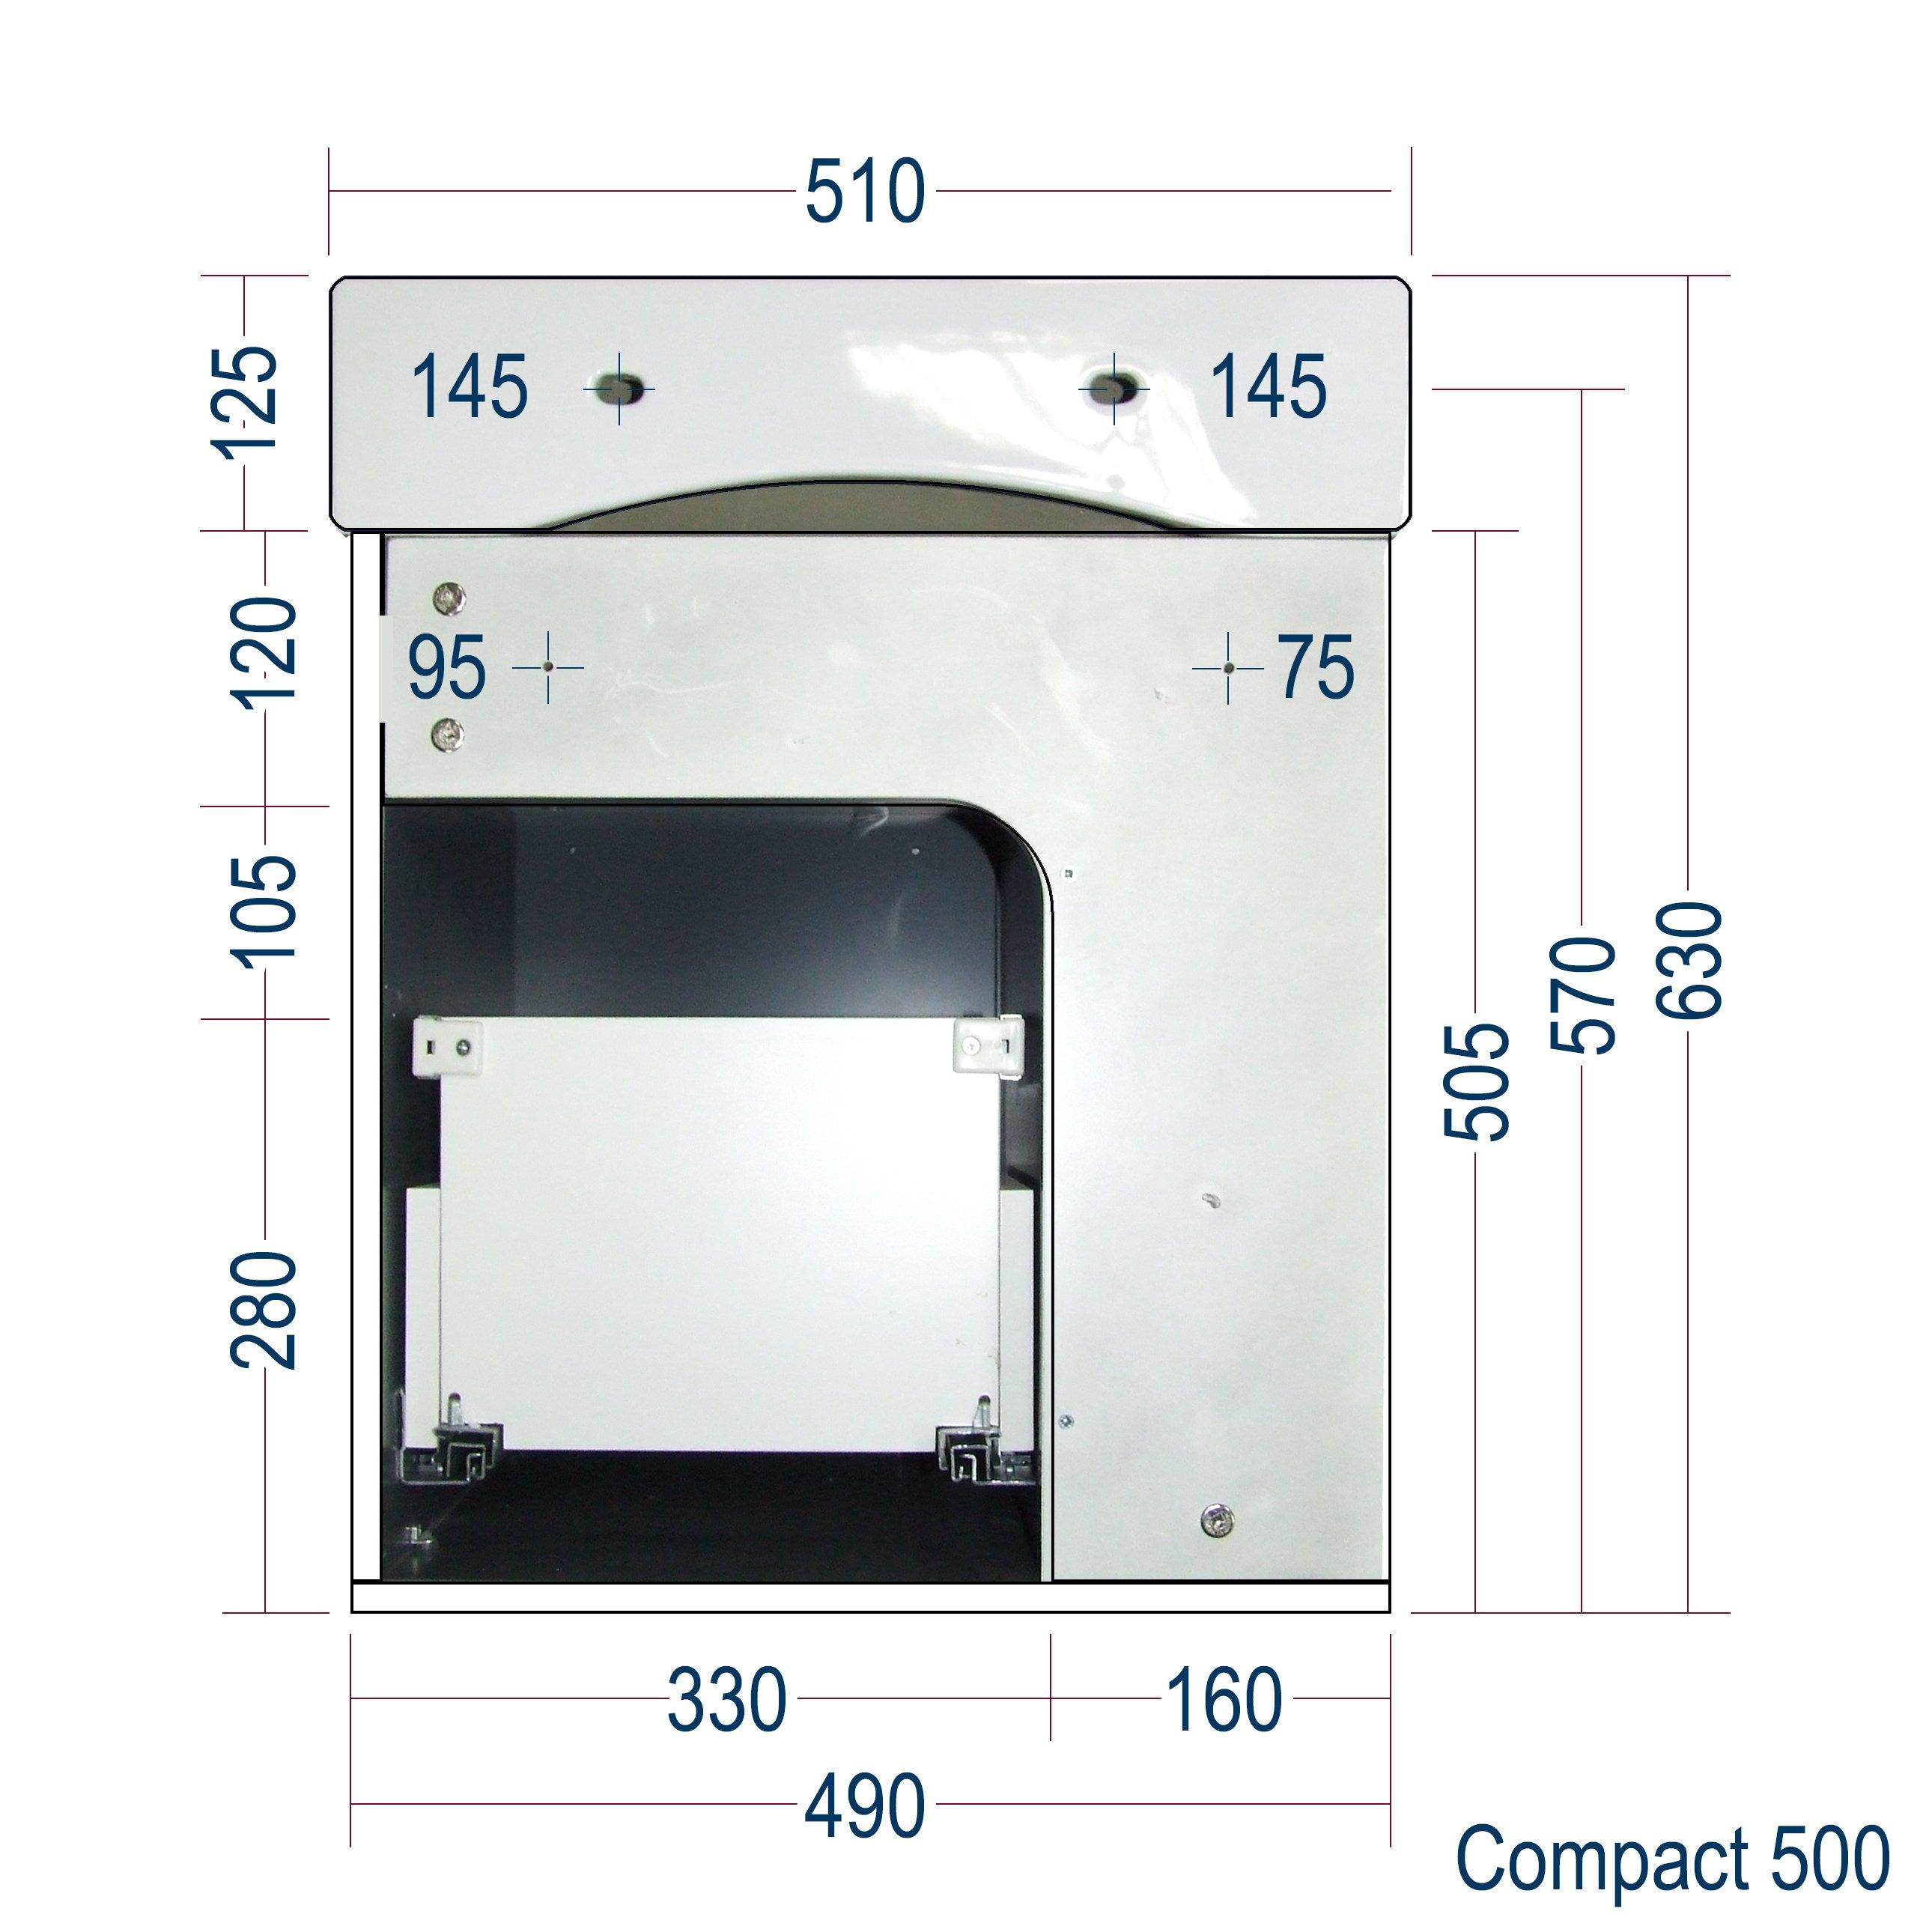 Badmöbel-Set Compact 500 für Gäste-WC - Taupe hell matt zoom thumbnail 5